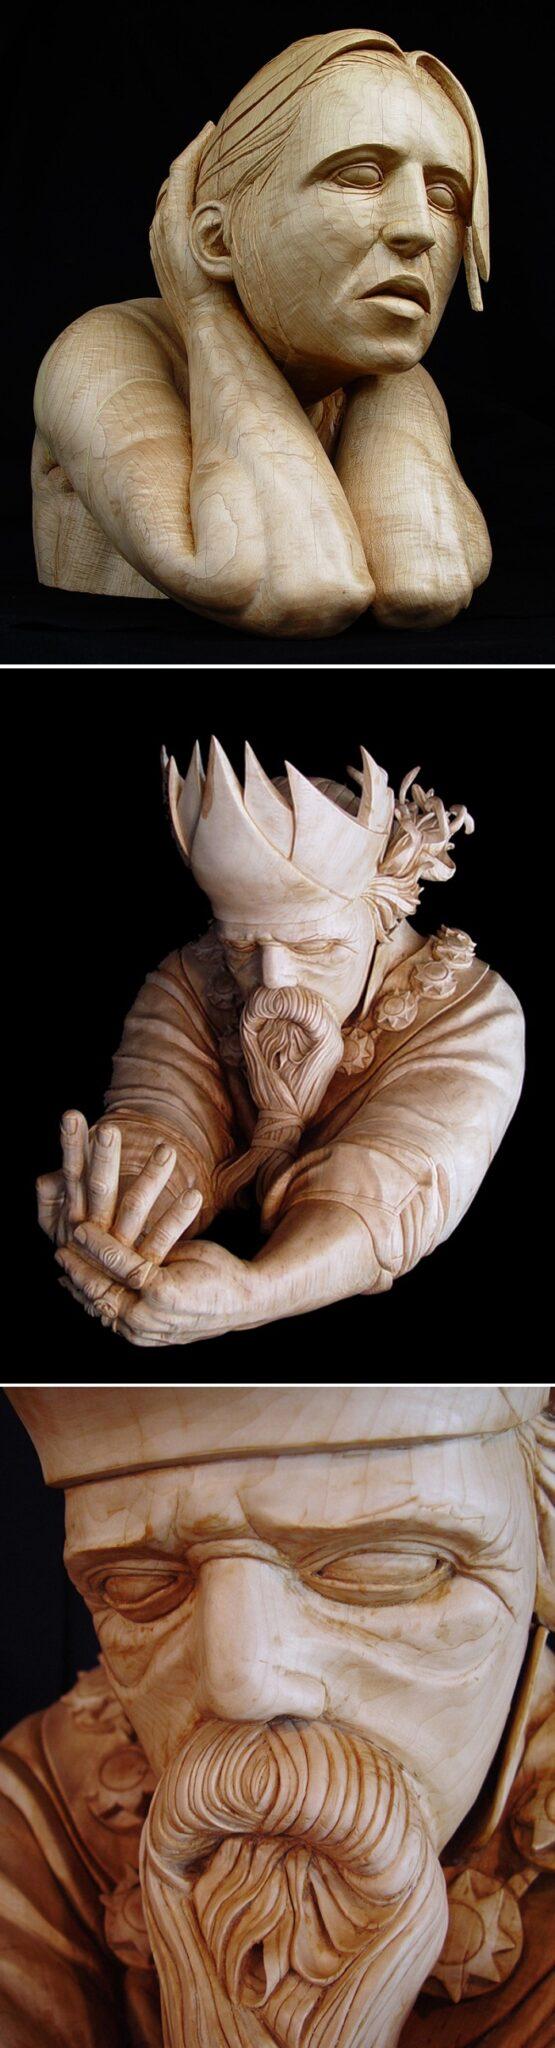 Figurative Wooden Sculptures by Stefanie Rocknak 4